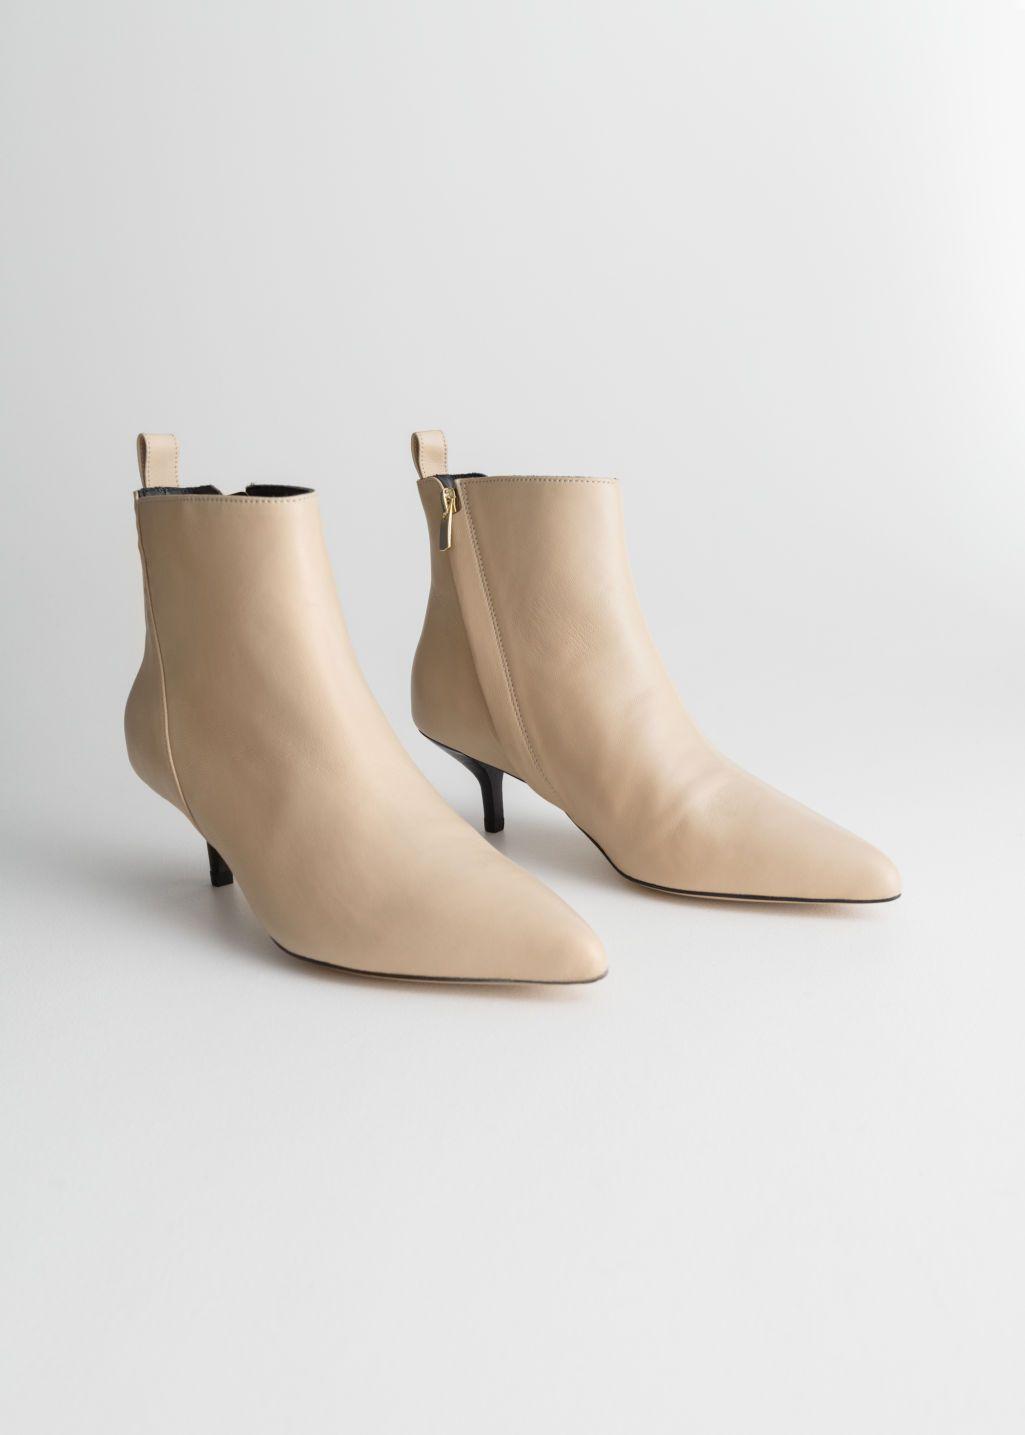 90dff6811aad3 Leather Kitten Heel Boots | Shoes | Beige ankle boots, Kitten heel ...